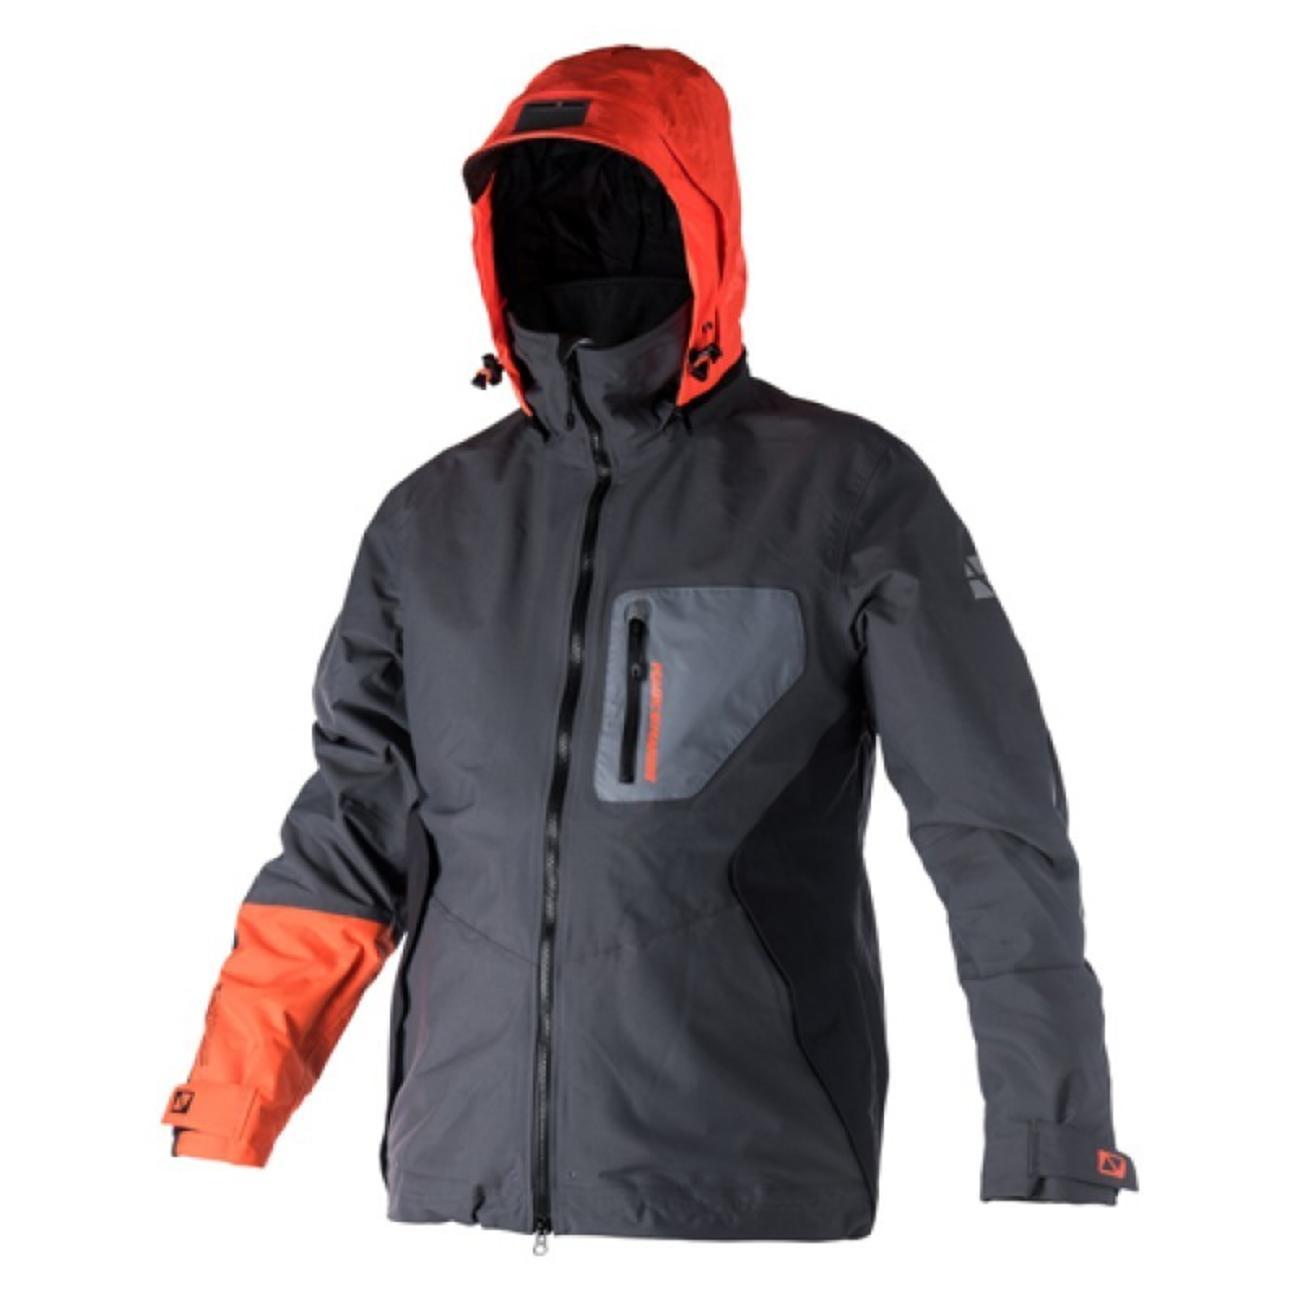 Element Jacket 2Layer ハードシェル レインジャケット